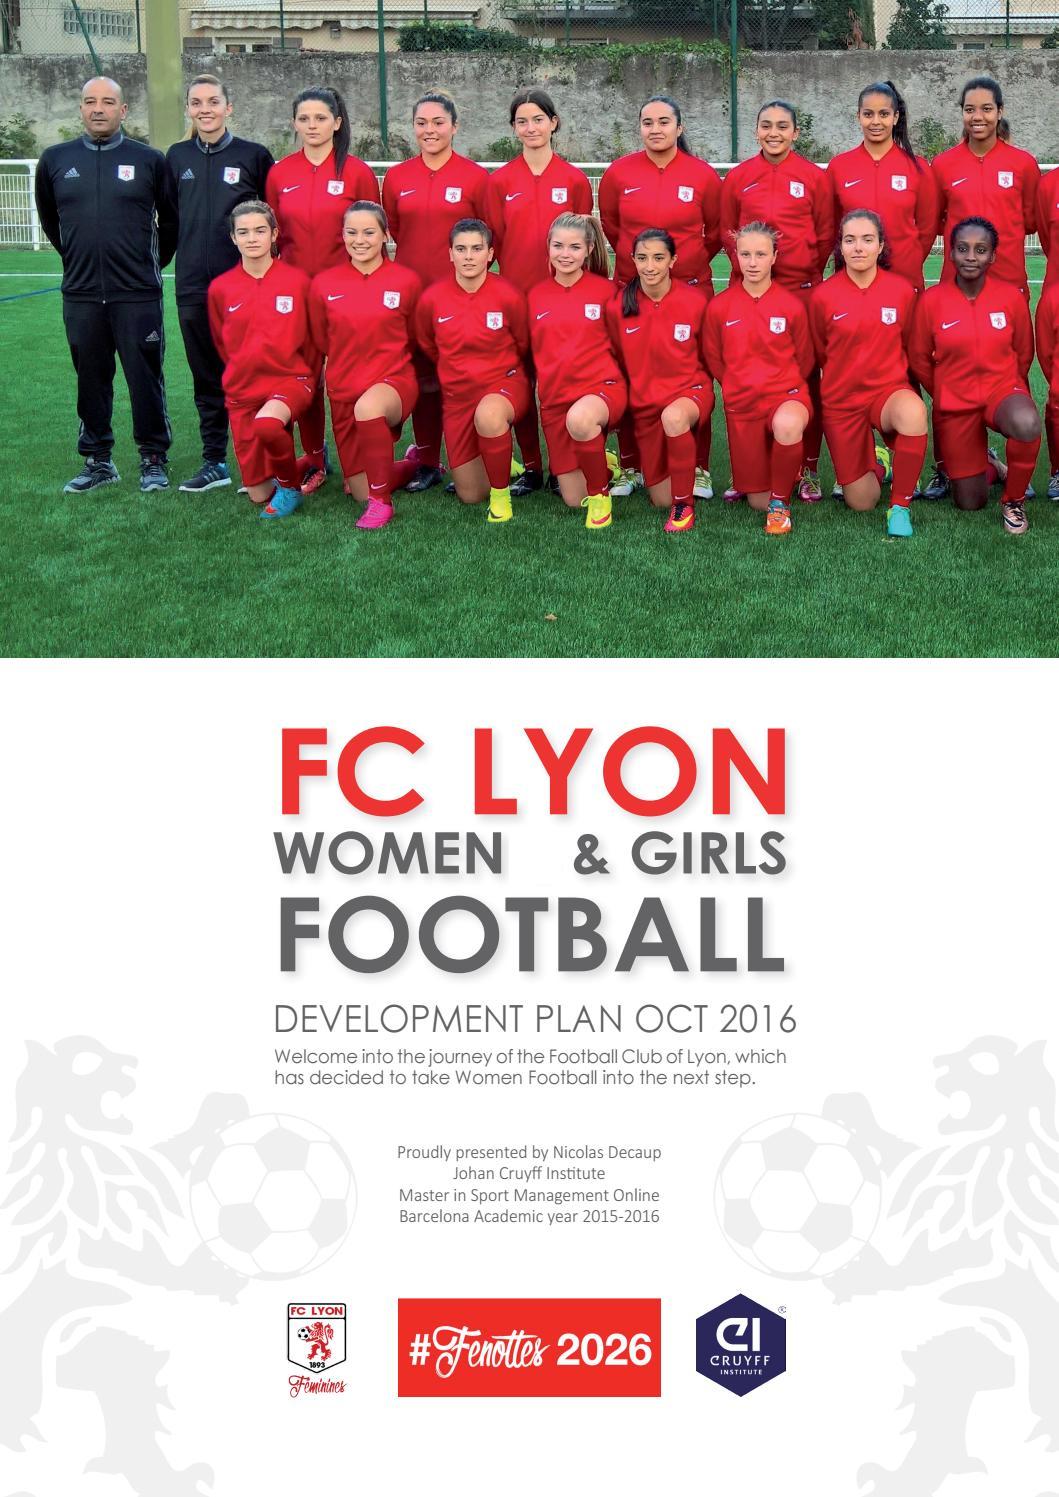 That Club amateur football feminin lyon commit error